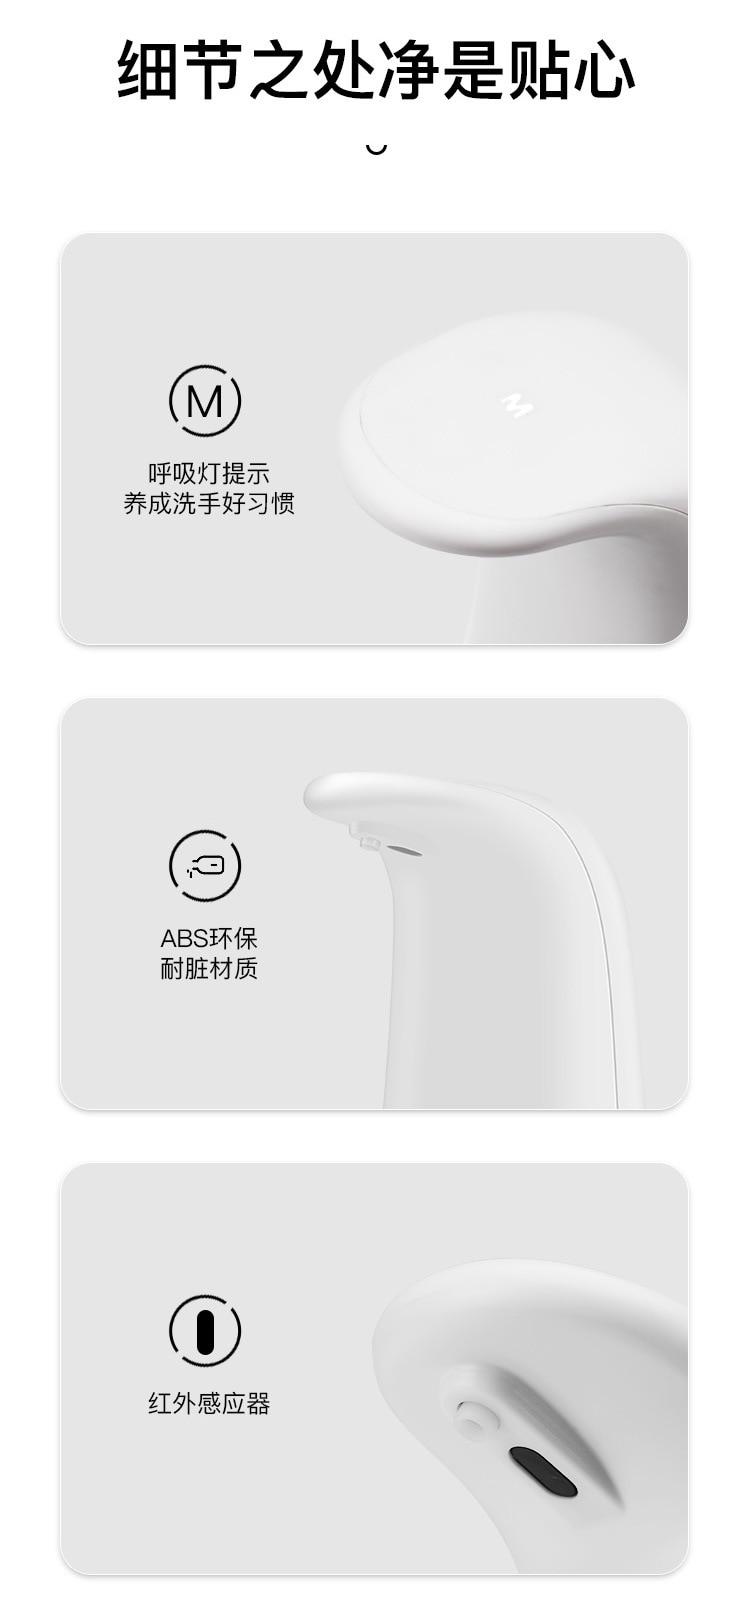 H877b09946e1b4617afd2403732761737t Automatic Foam Soap Dispenser Infrared Sensing Foam Soap Dispenser Induction Liquid Soap Dispenser For Bathroom Kitchen Hotel